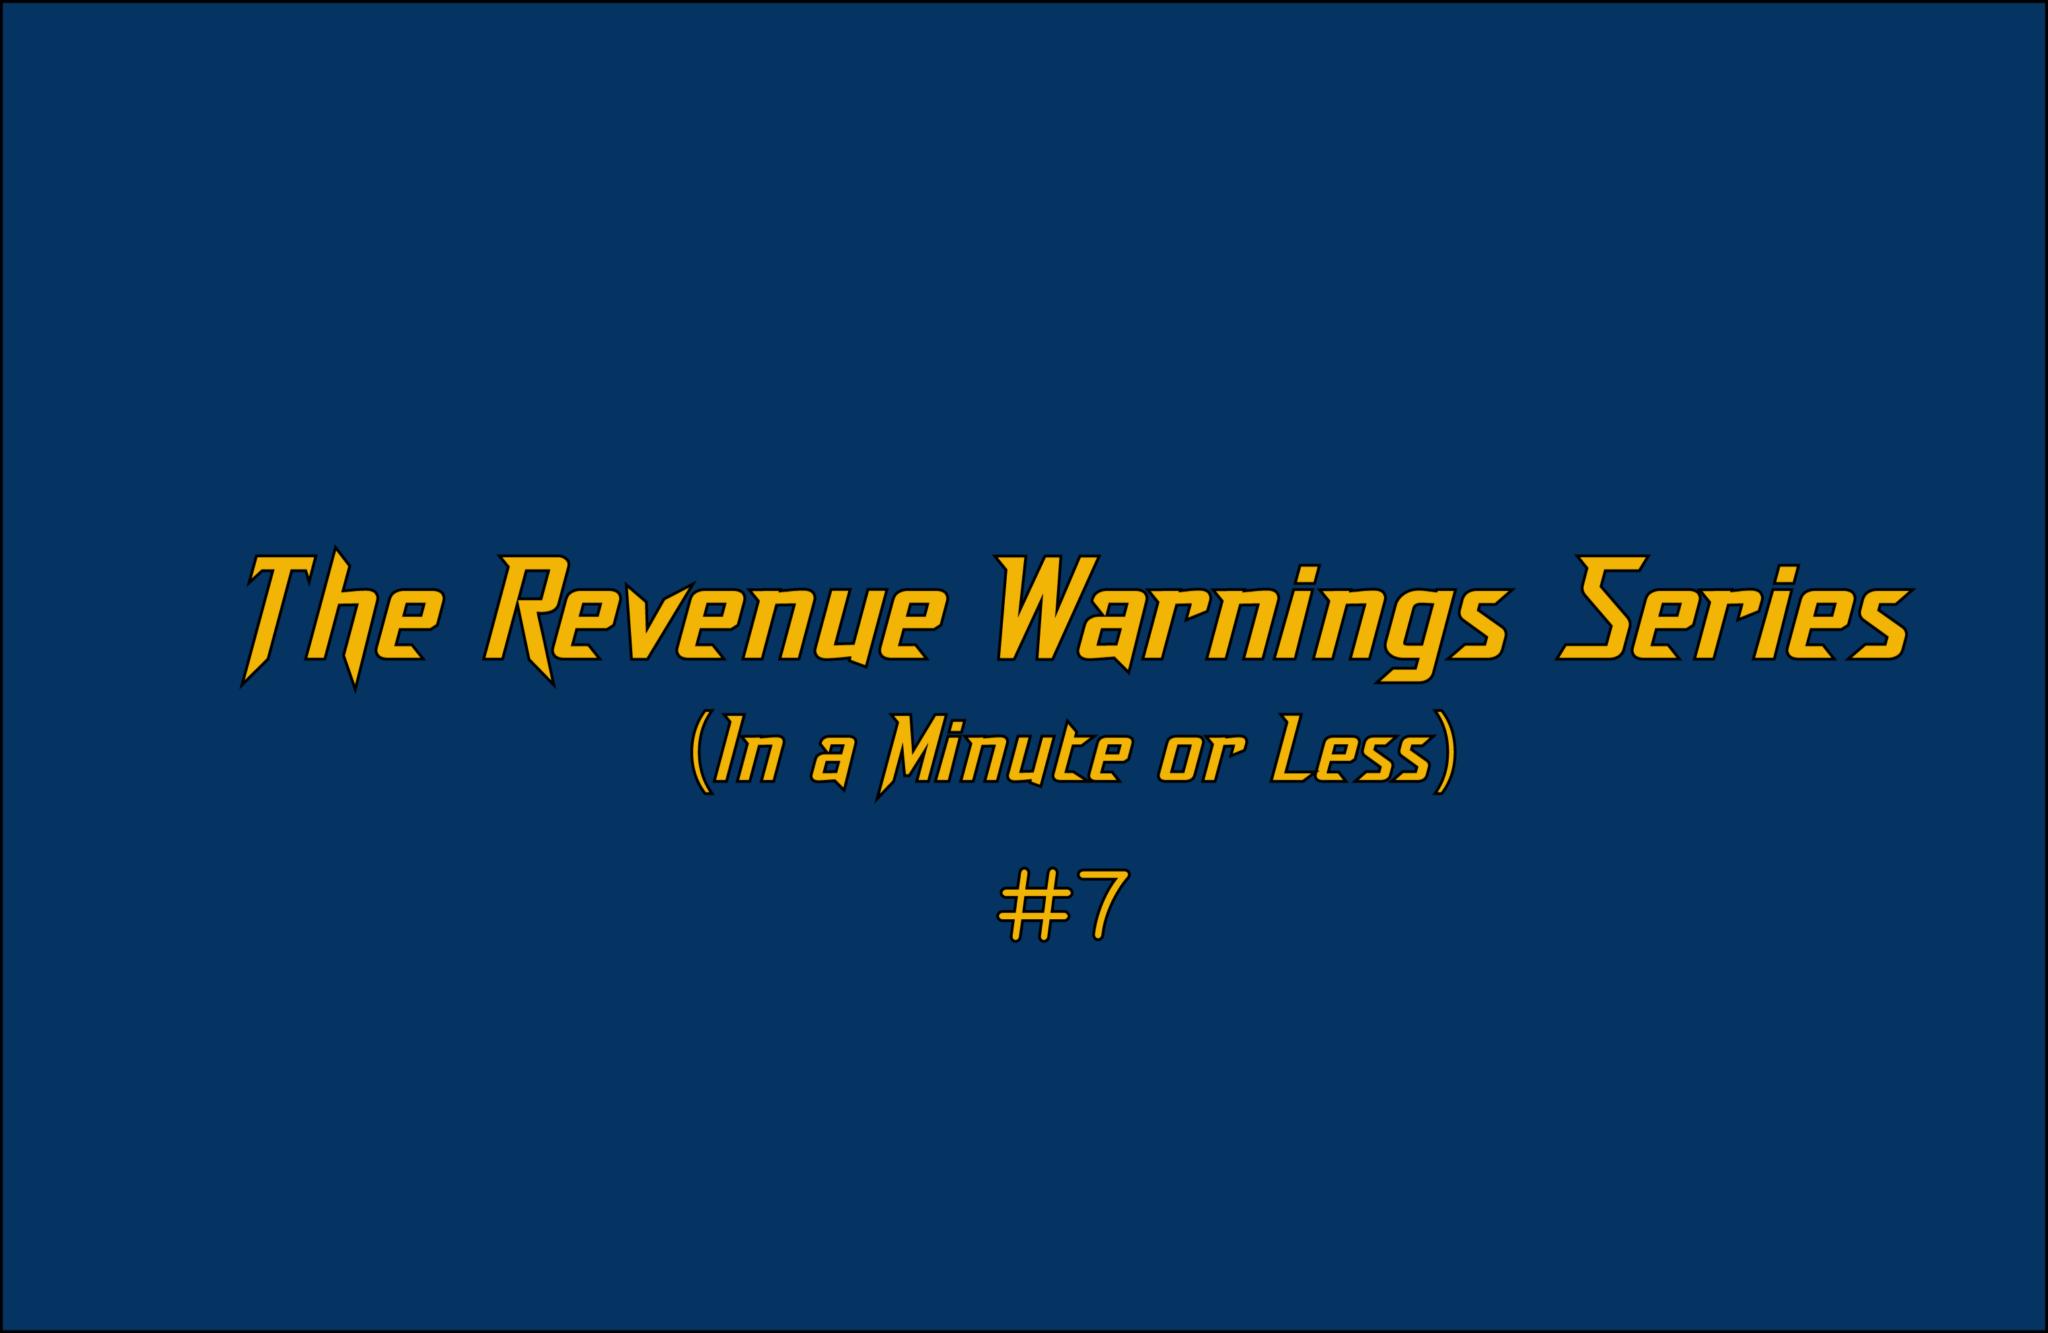 Revenue Warning #7: Don't Create a Culture